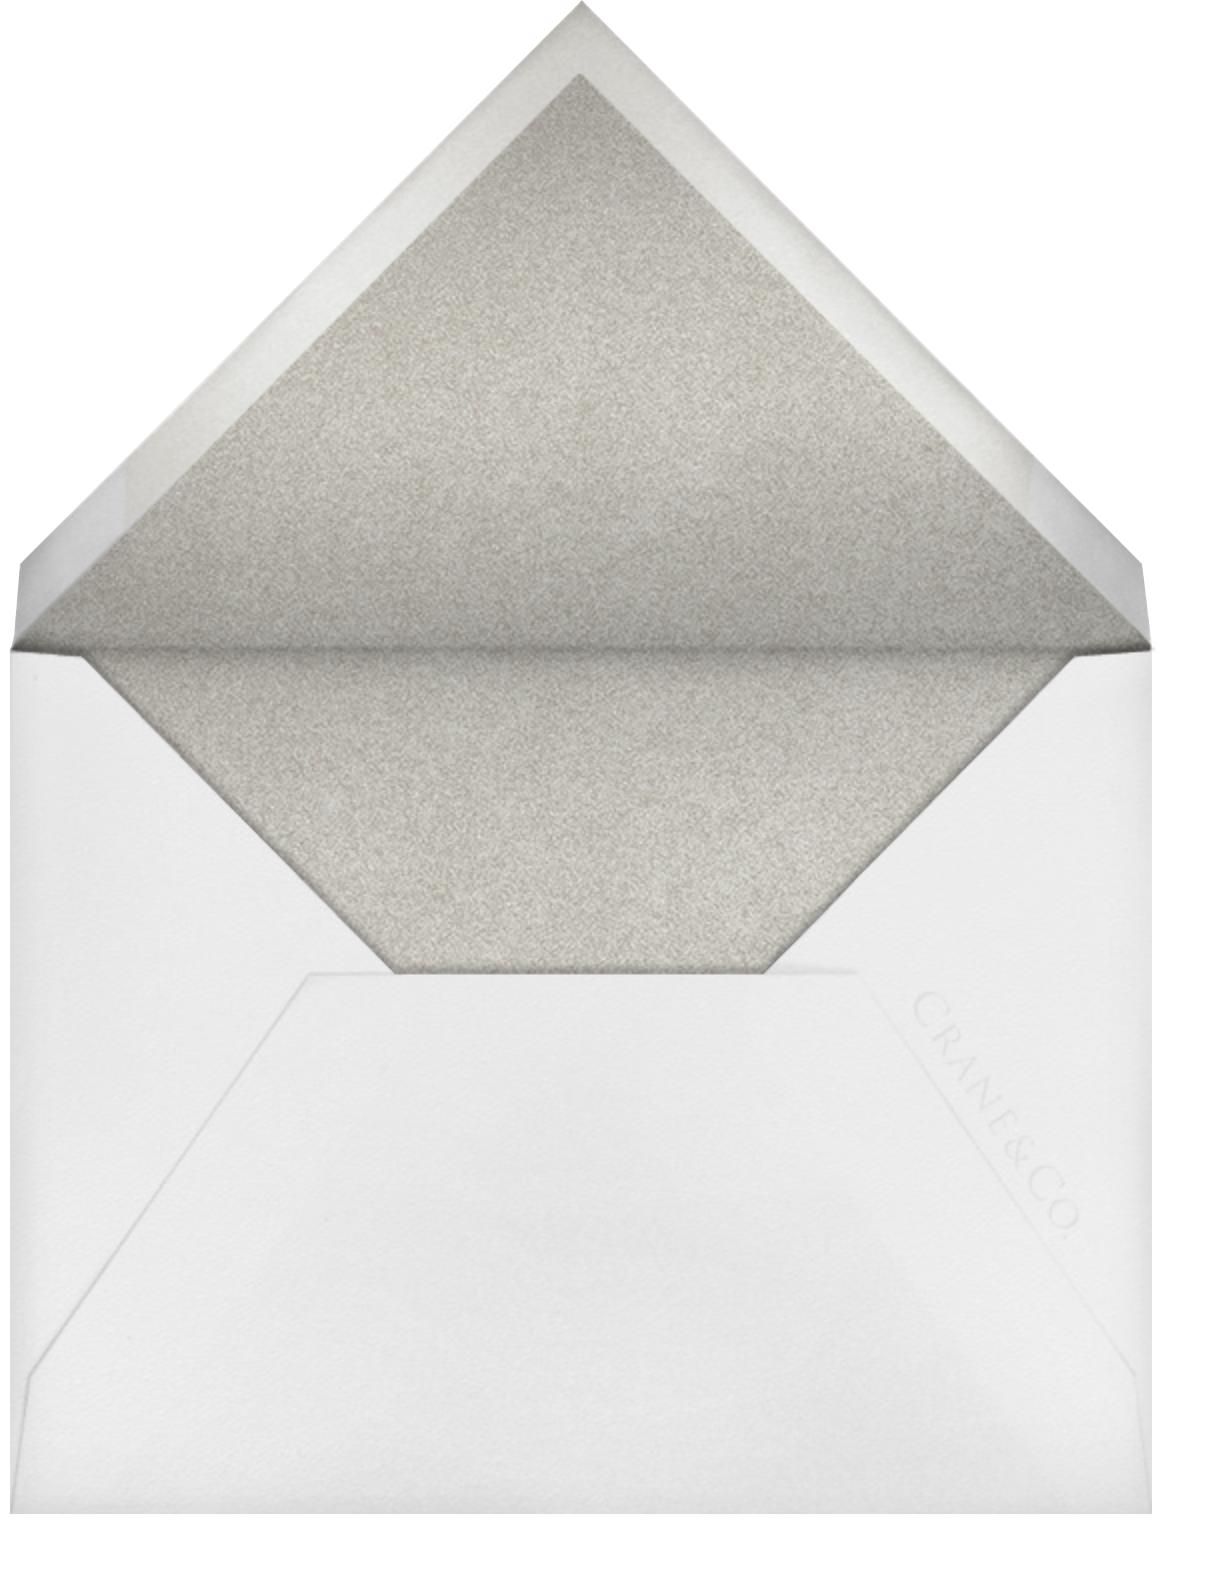 Cheverny - Pewter Gray - Crane & Co. - Envelope